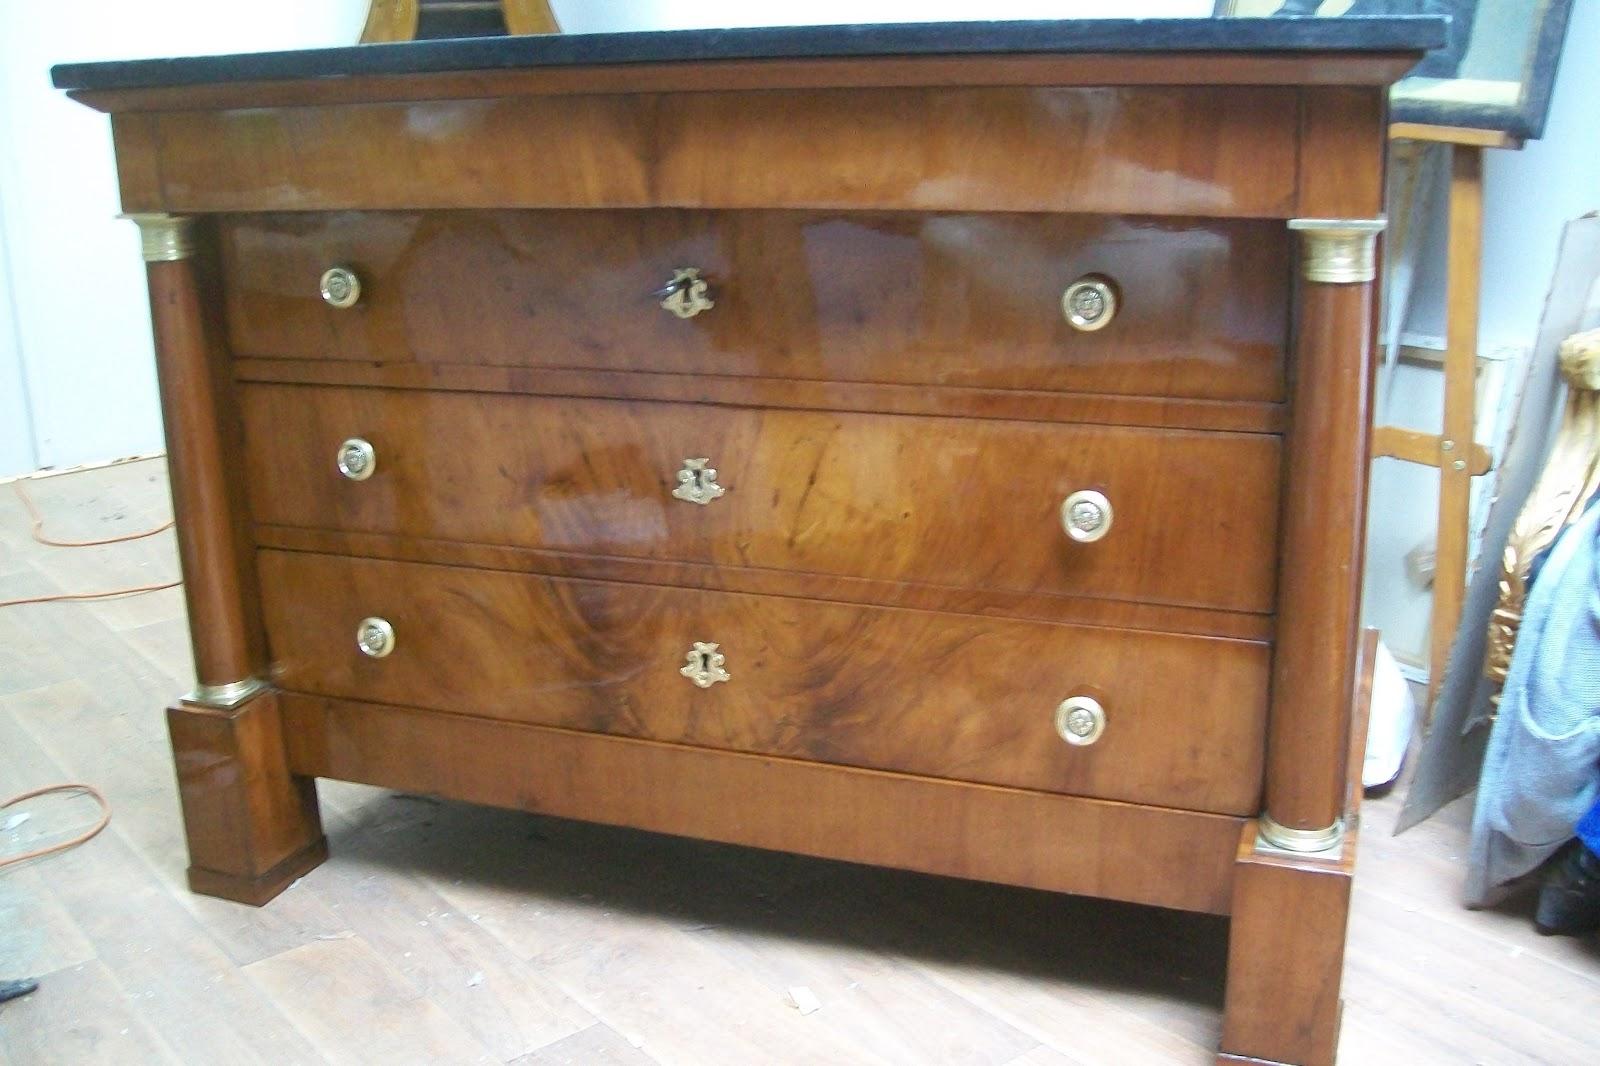 antiquit s morlaix cherbourg paris londres. Black Bedroom Furniture Sets. Home Design Ideas